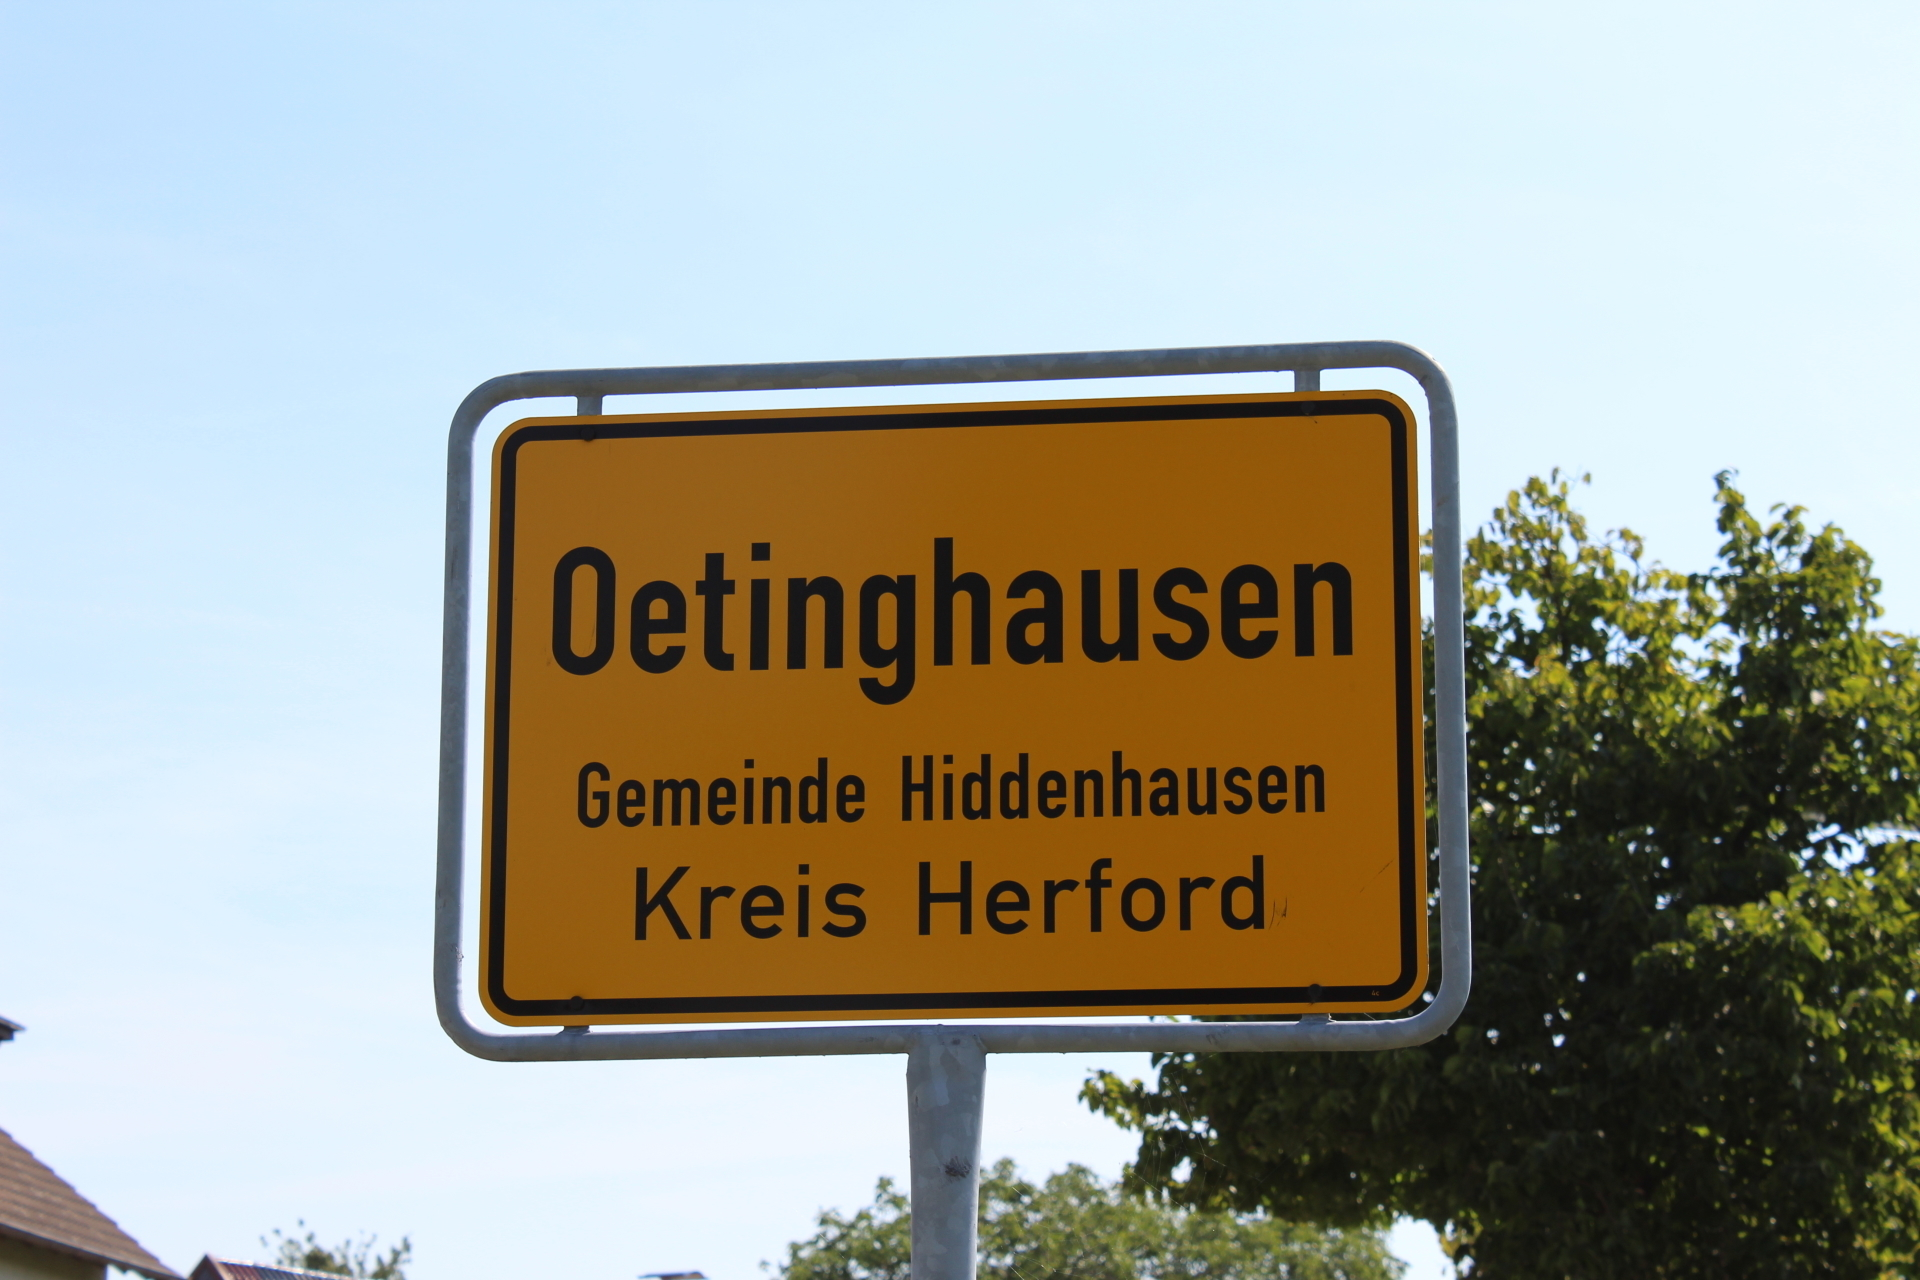 Doku Dorfwerkstatt Oetinghausen am 13.11.2018